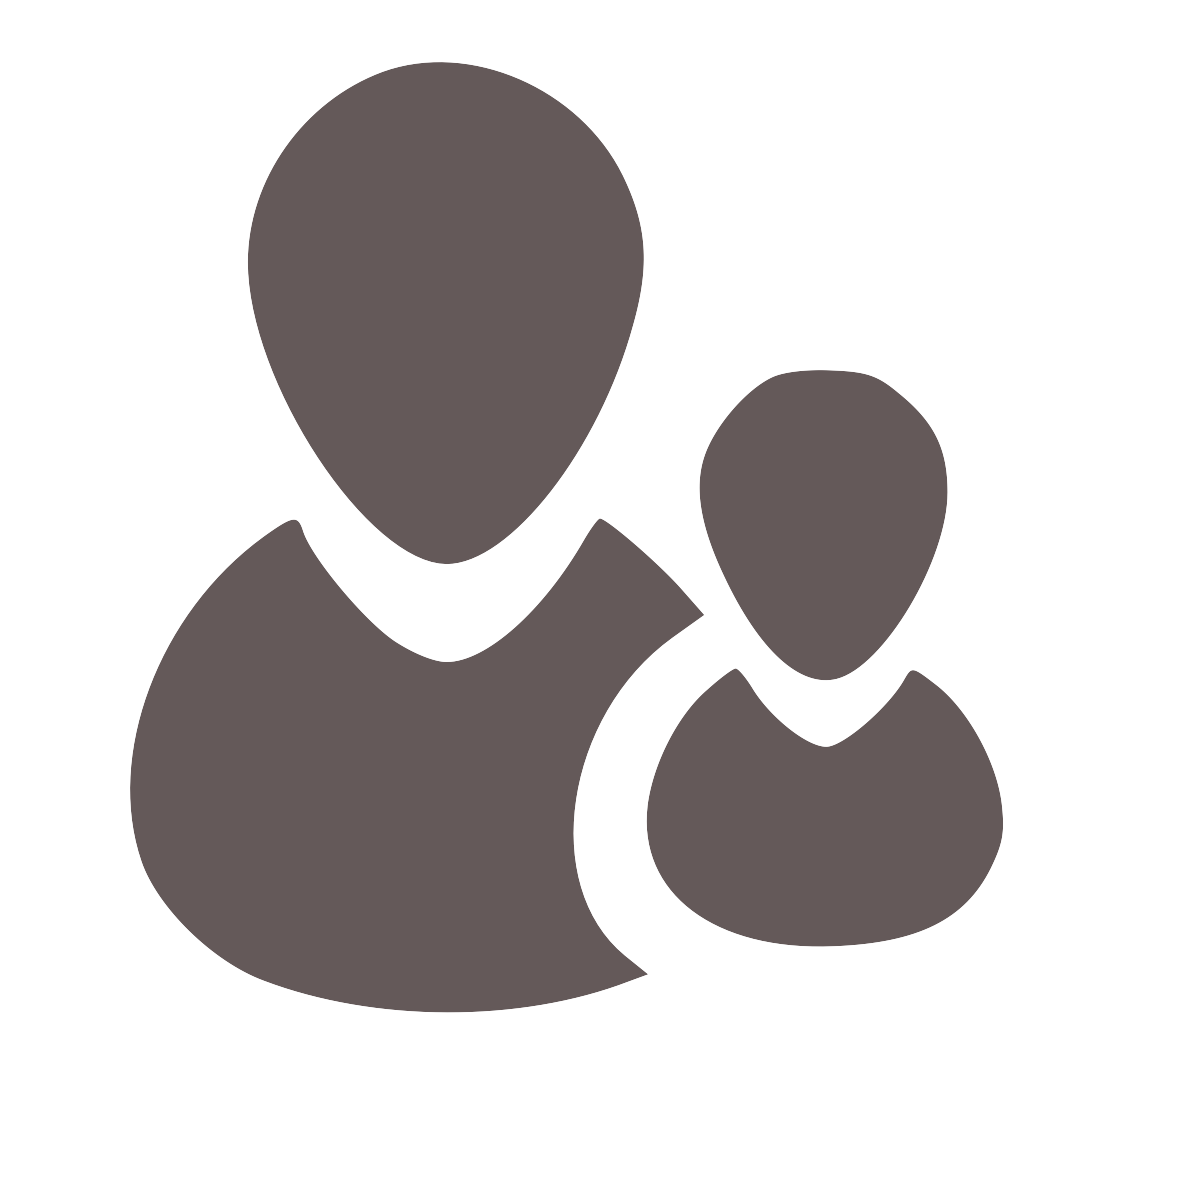 noun_Family_18172_645959.png